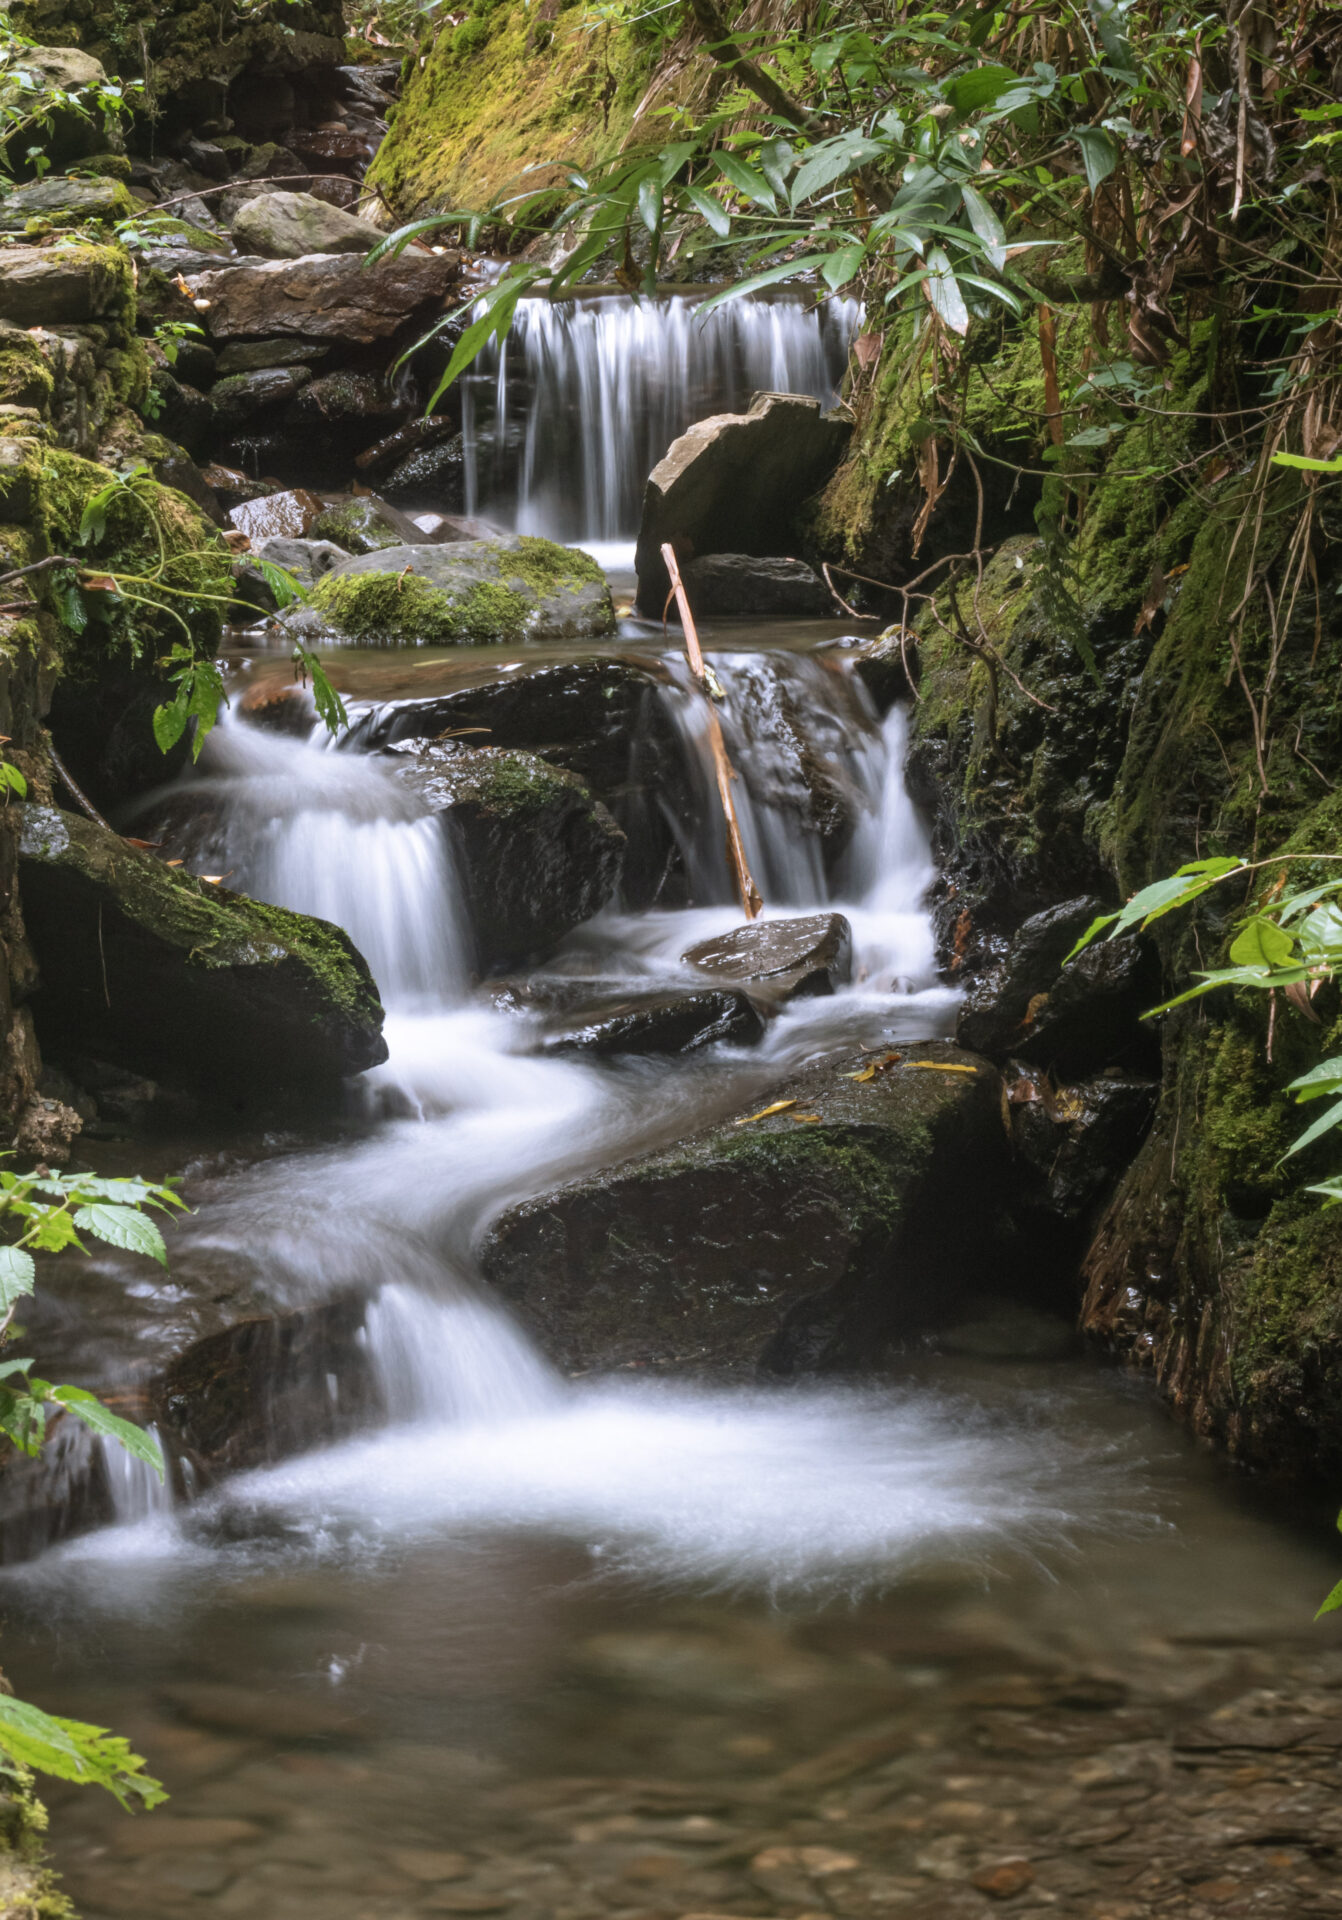 Long Exposure Shutter Speed at Jibhi Waterfall